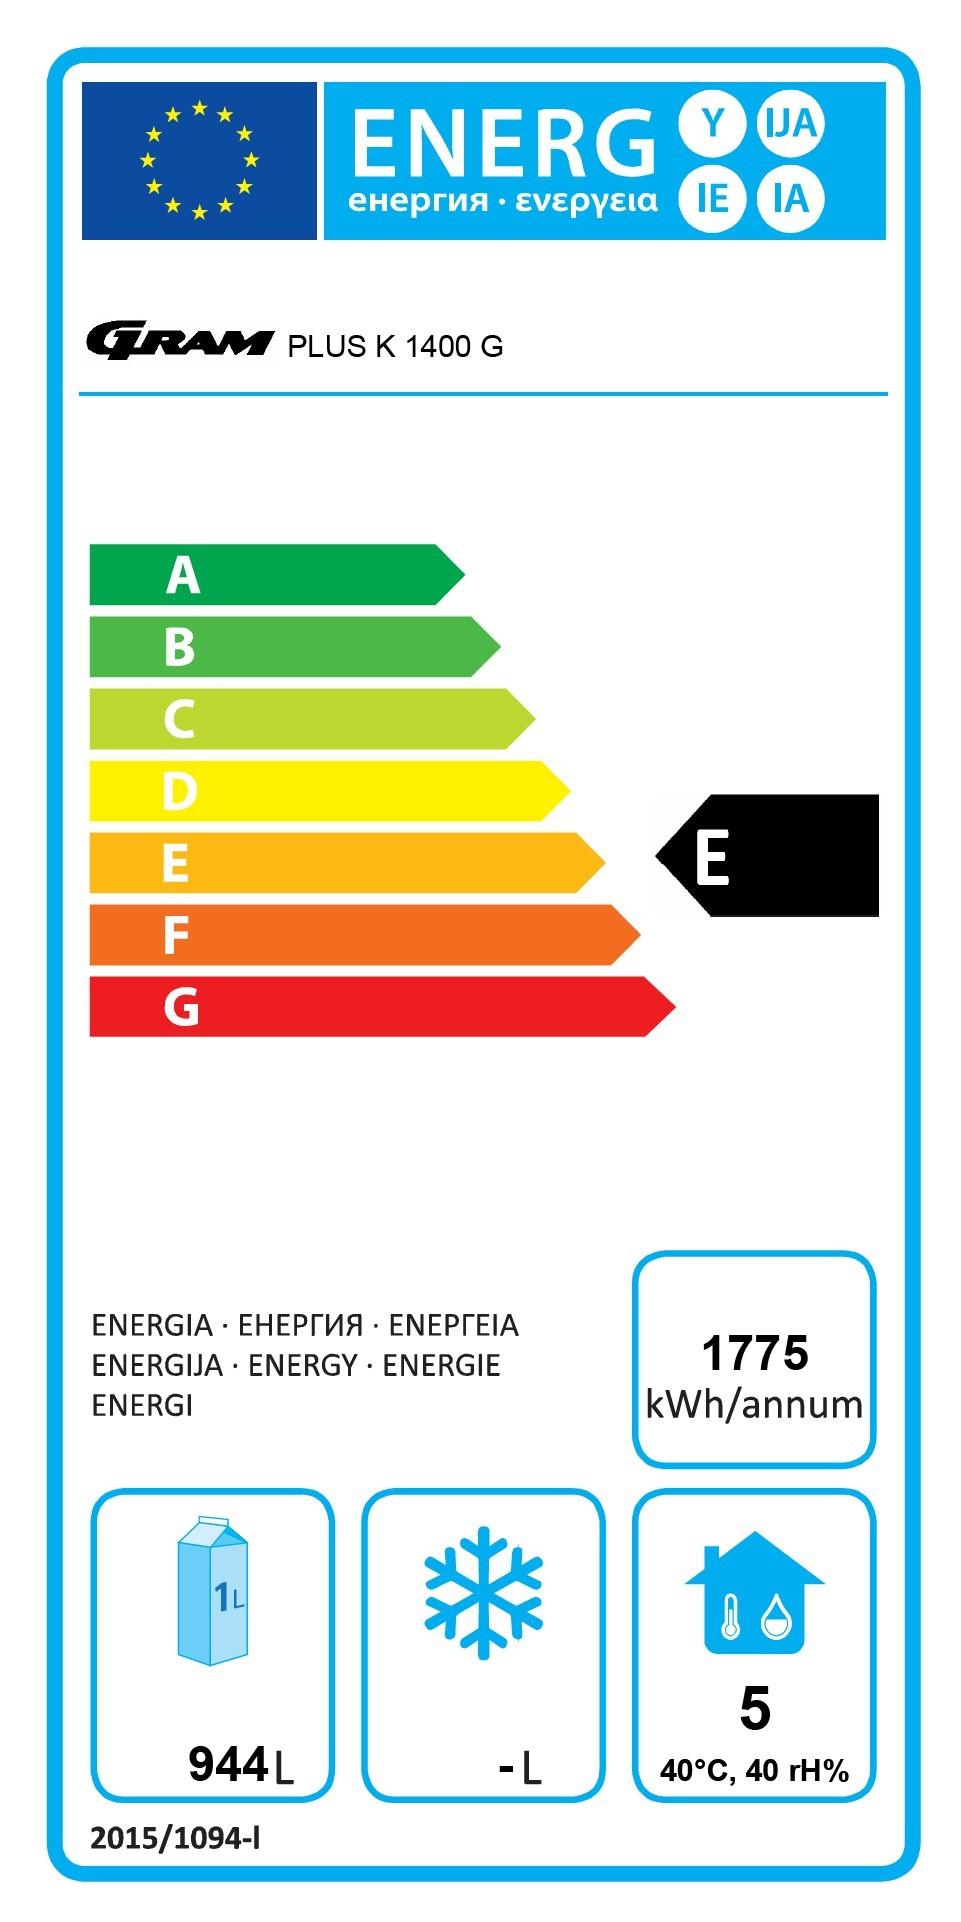 PLUS K 1400 RSH C 10N 1400 Ltr Upright Fridge Energy Rating